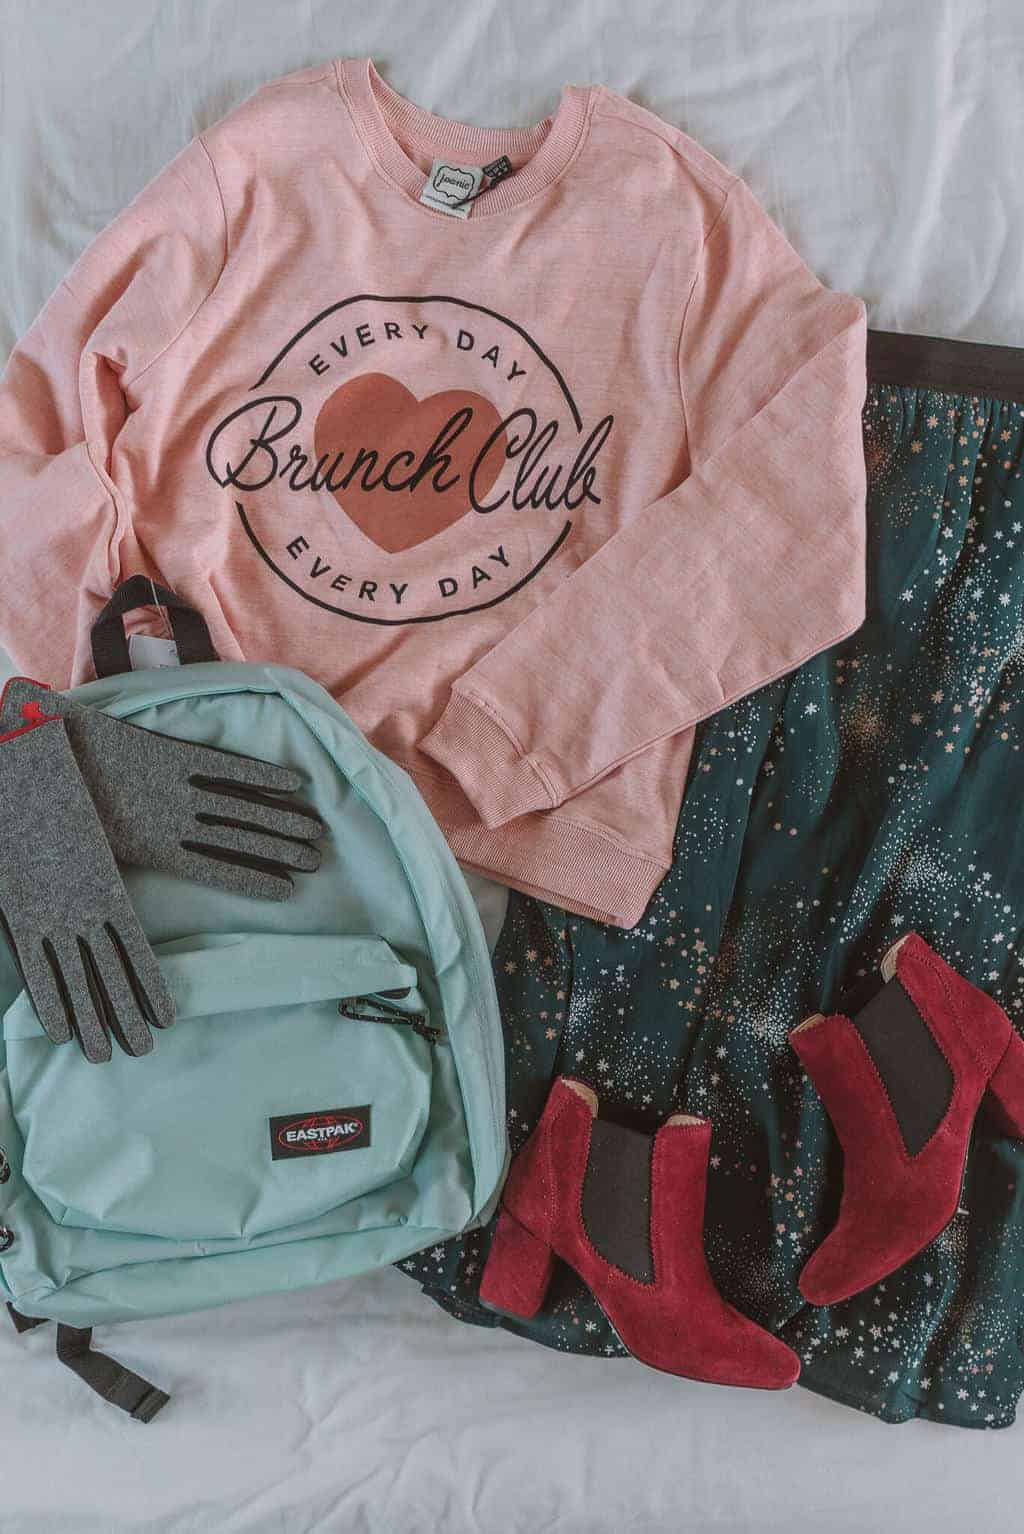 Fashion Flatlay - Christmas Gift Guide 2018: Brilliant Christmas Gift Ideas For Her #whatshotblog